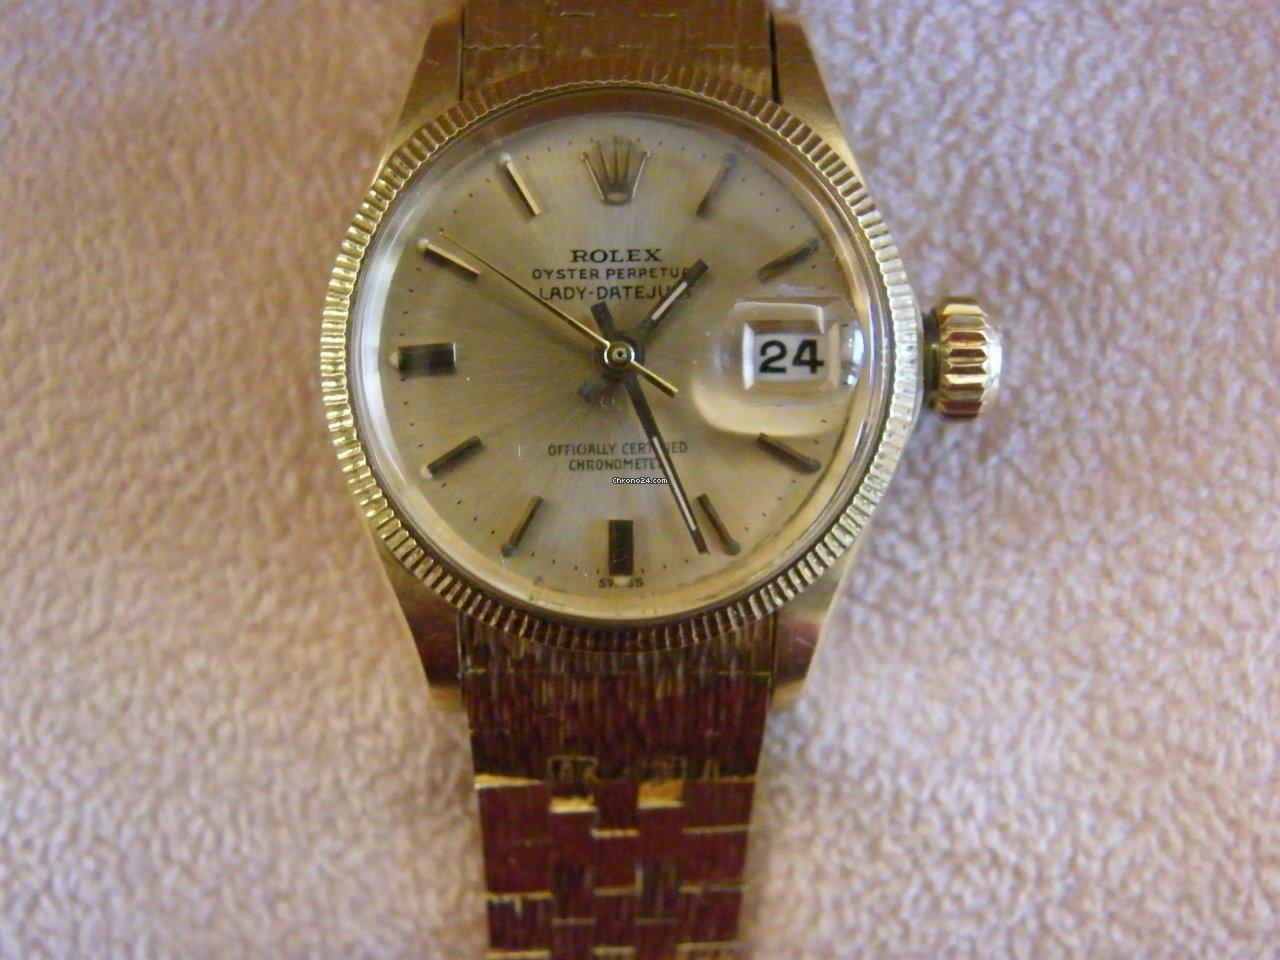 Rolex Lady-Datejust 6521 1968 usato